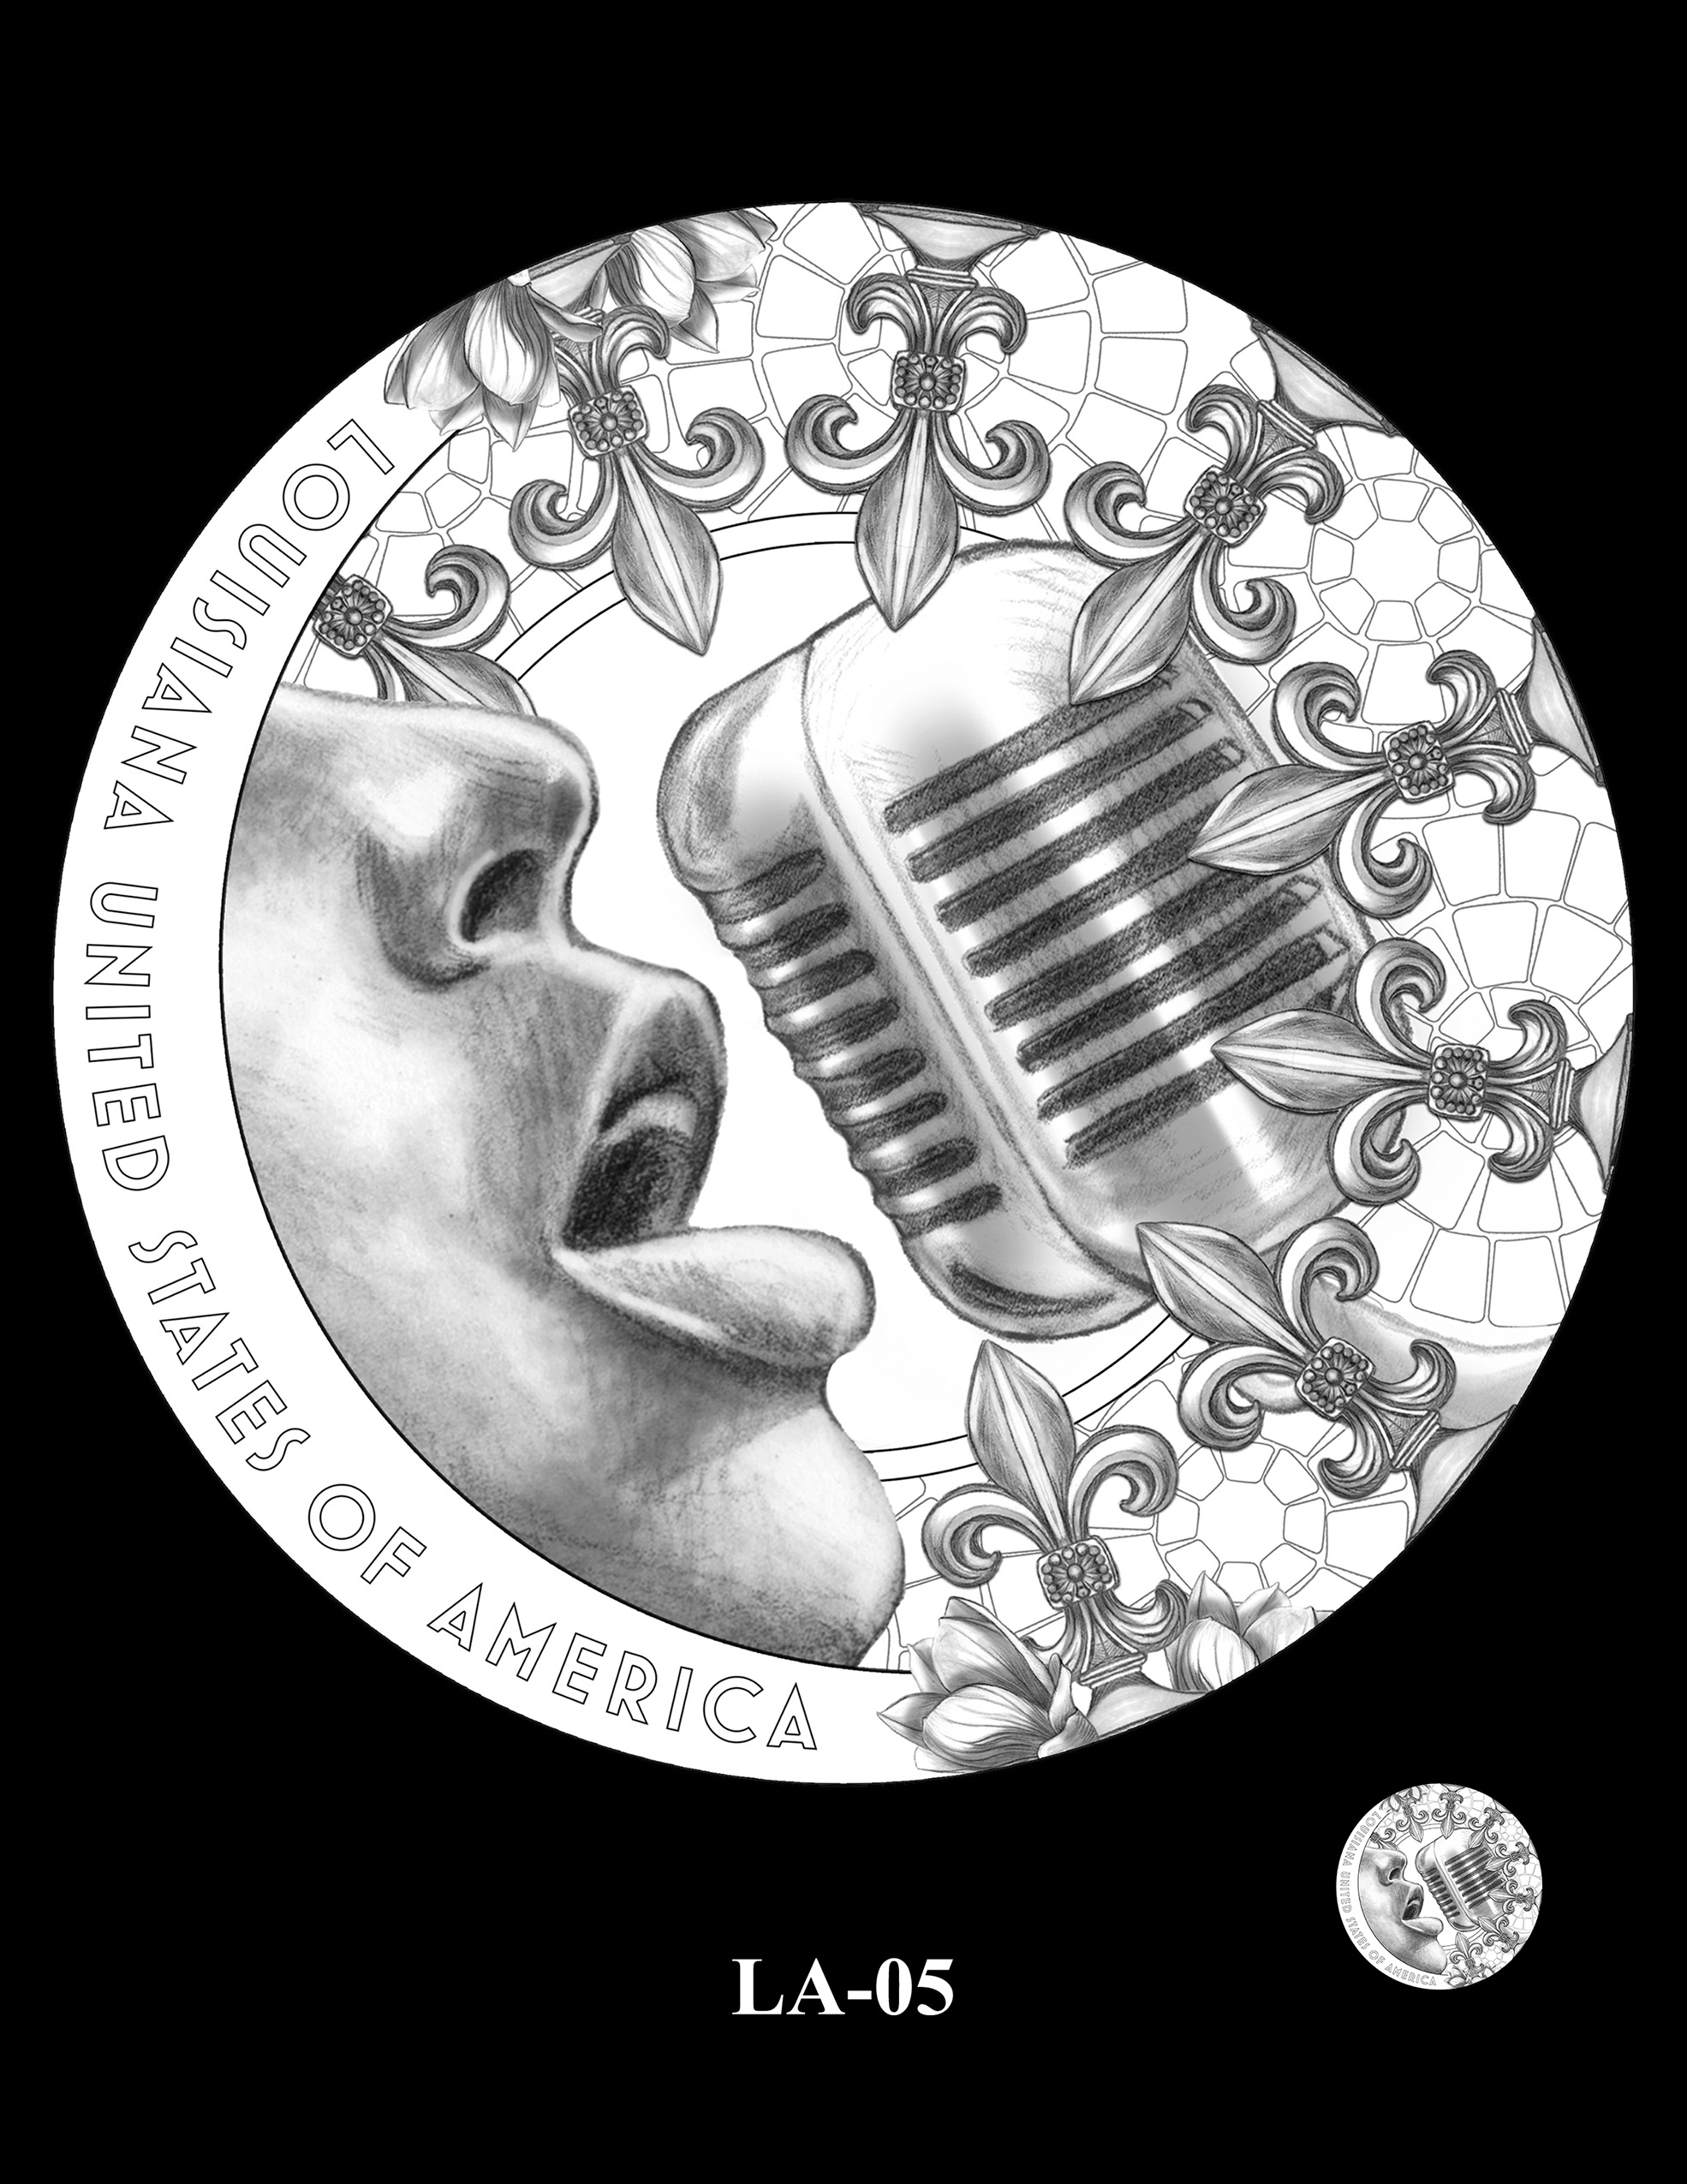 LA-05 -- 2023 American Innovation $1 Coin Program - Louisiana